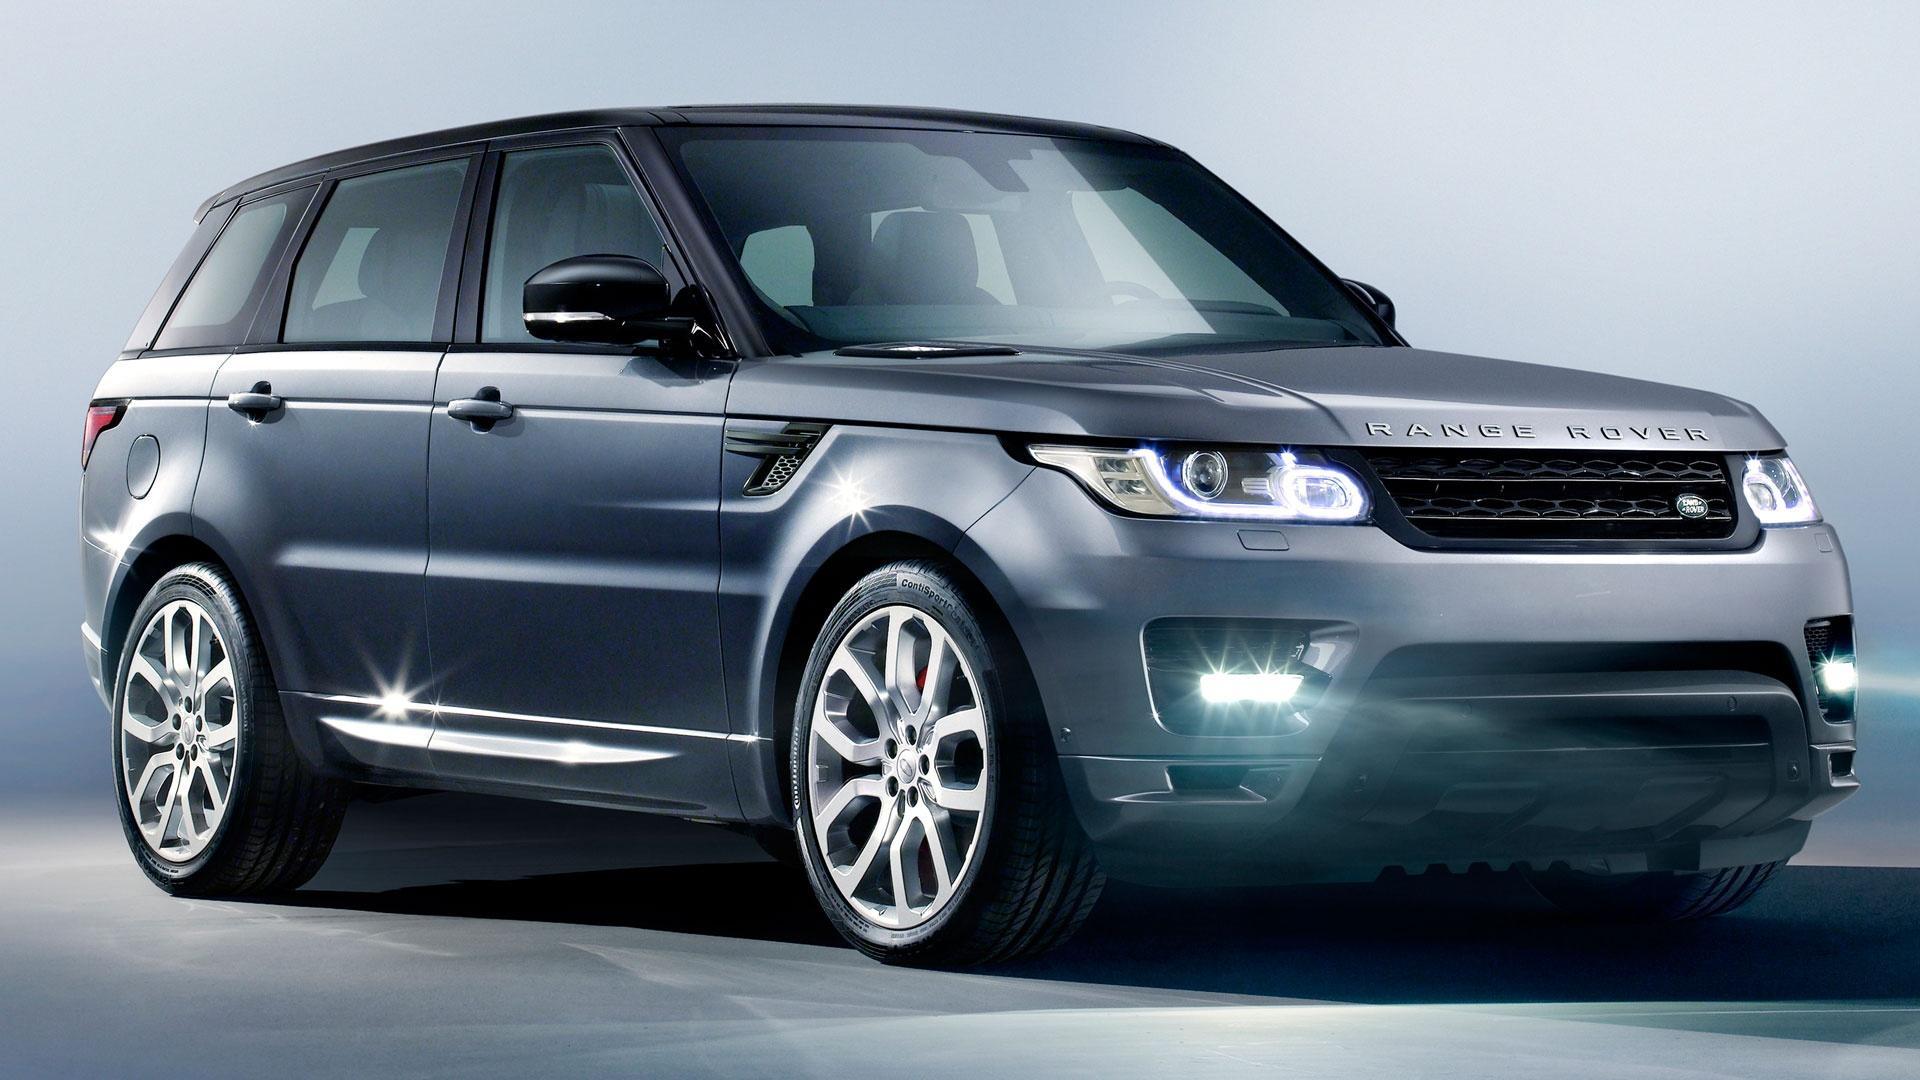 2014 Land Rover Range Rover Sport & 2014 Cadillac CTS image